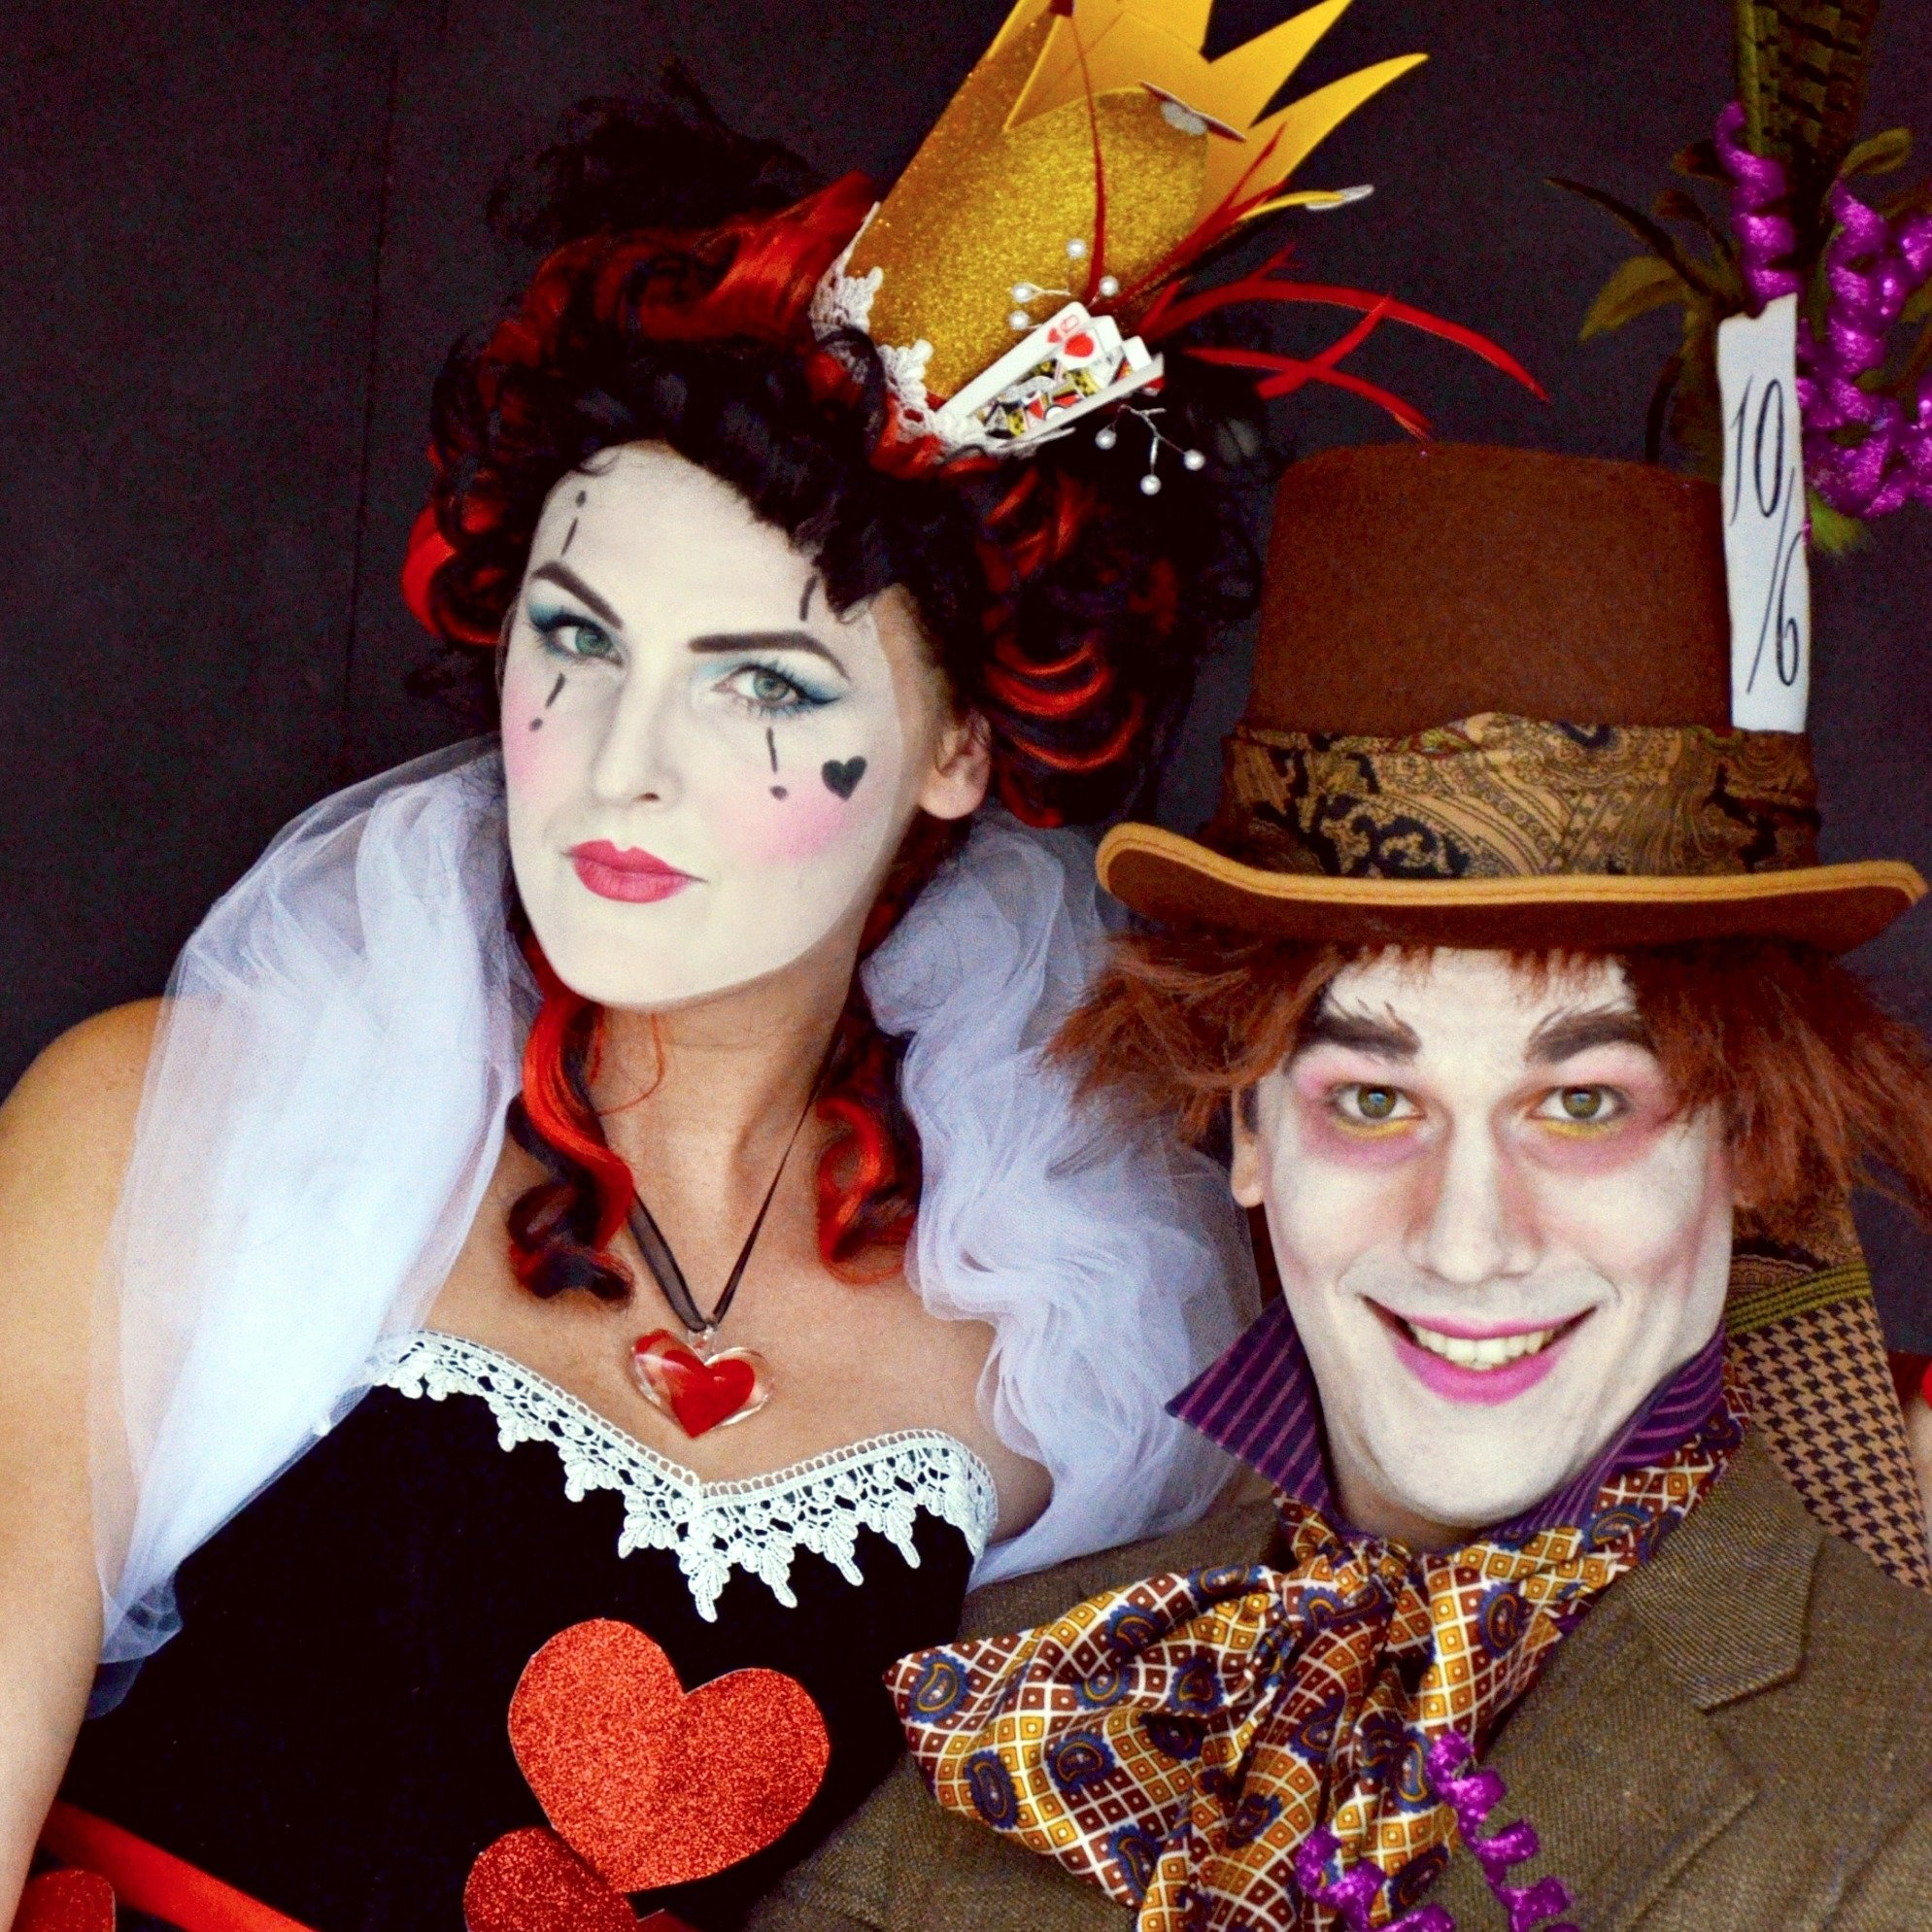 10 Trendy Queen Of Hearts Makeup Ideas mad hatter and queen of heartscouples halloween costume ideas 2020